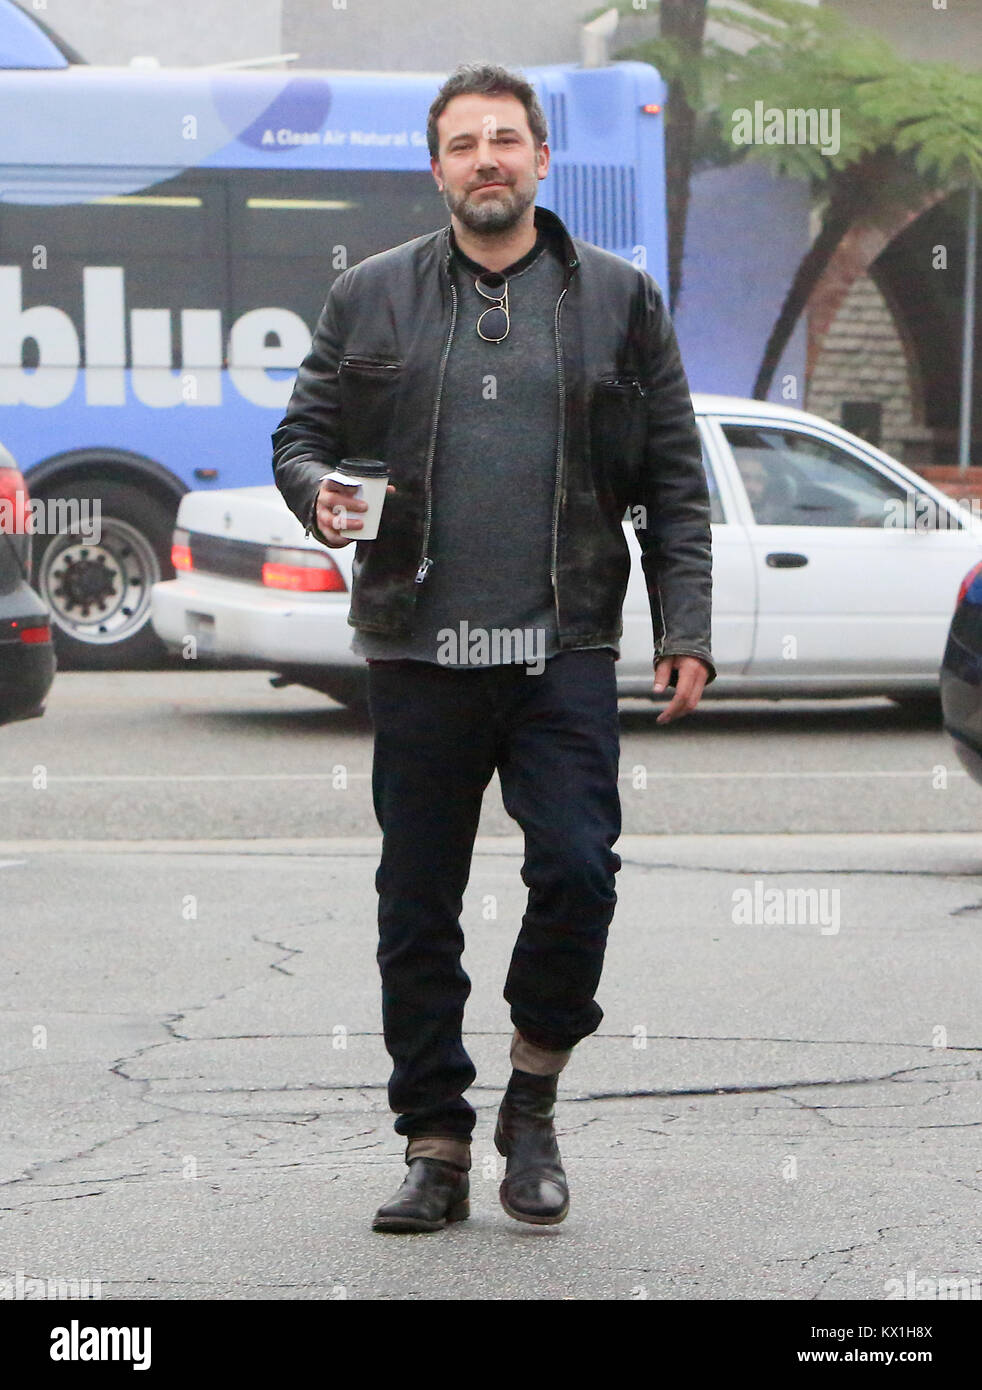 Ben Affleck passe avec sa petite amie le shopping. 05 janvier, 2018 Crédit: Gtres información más Photo Stock